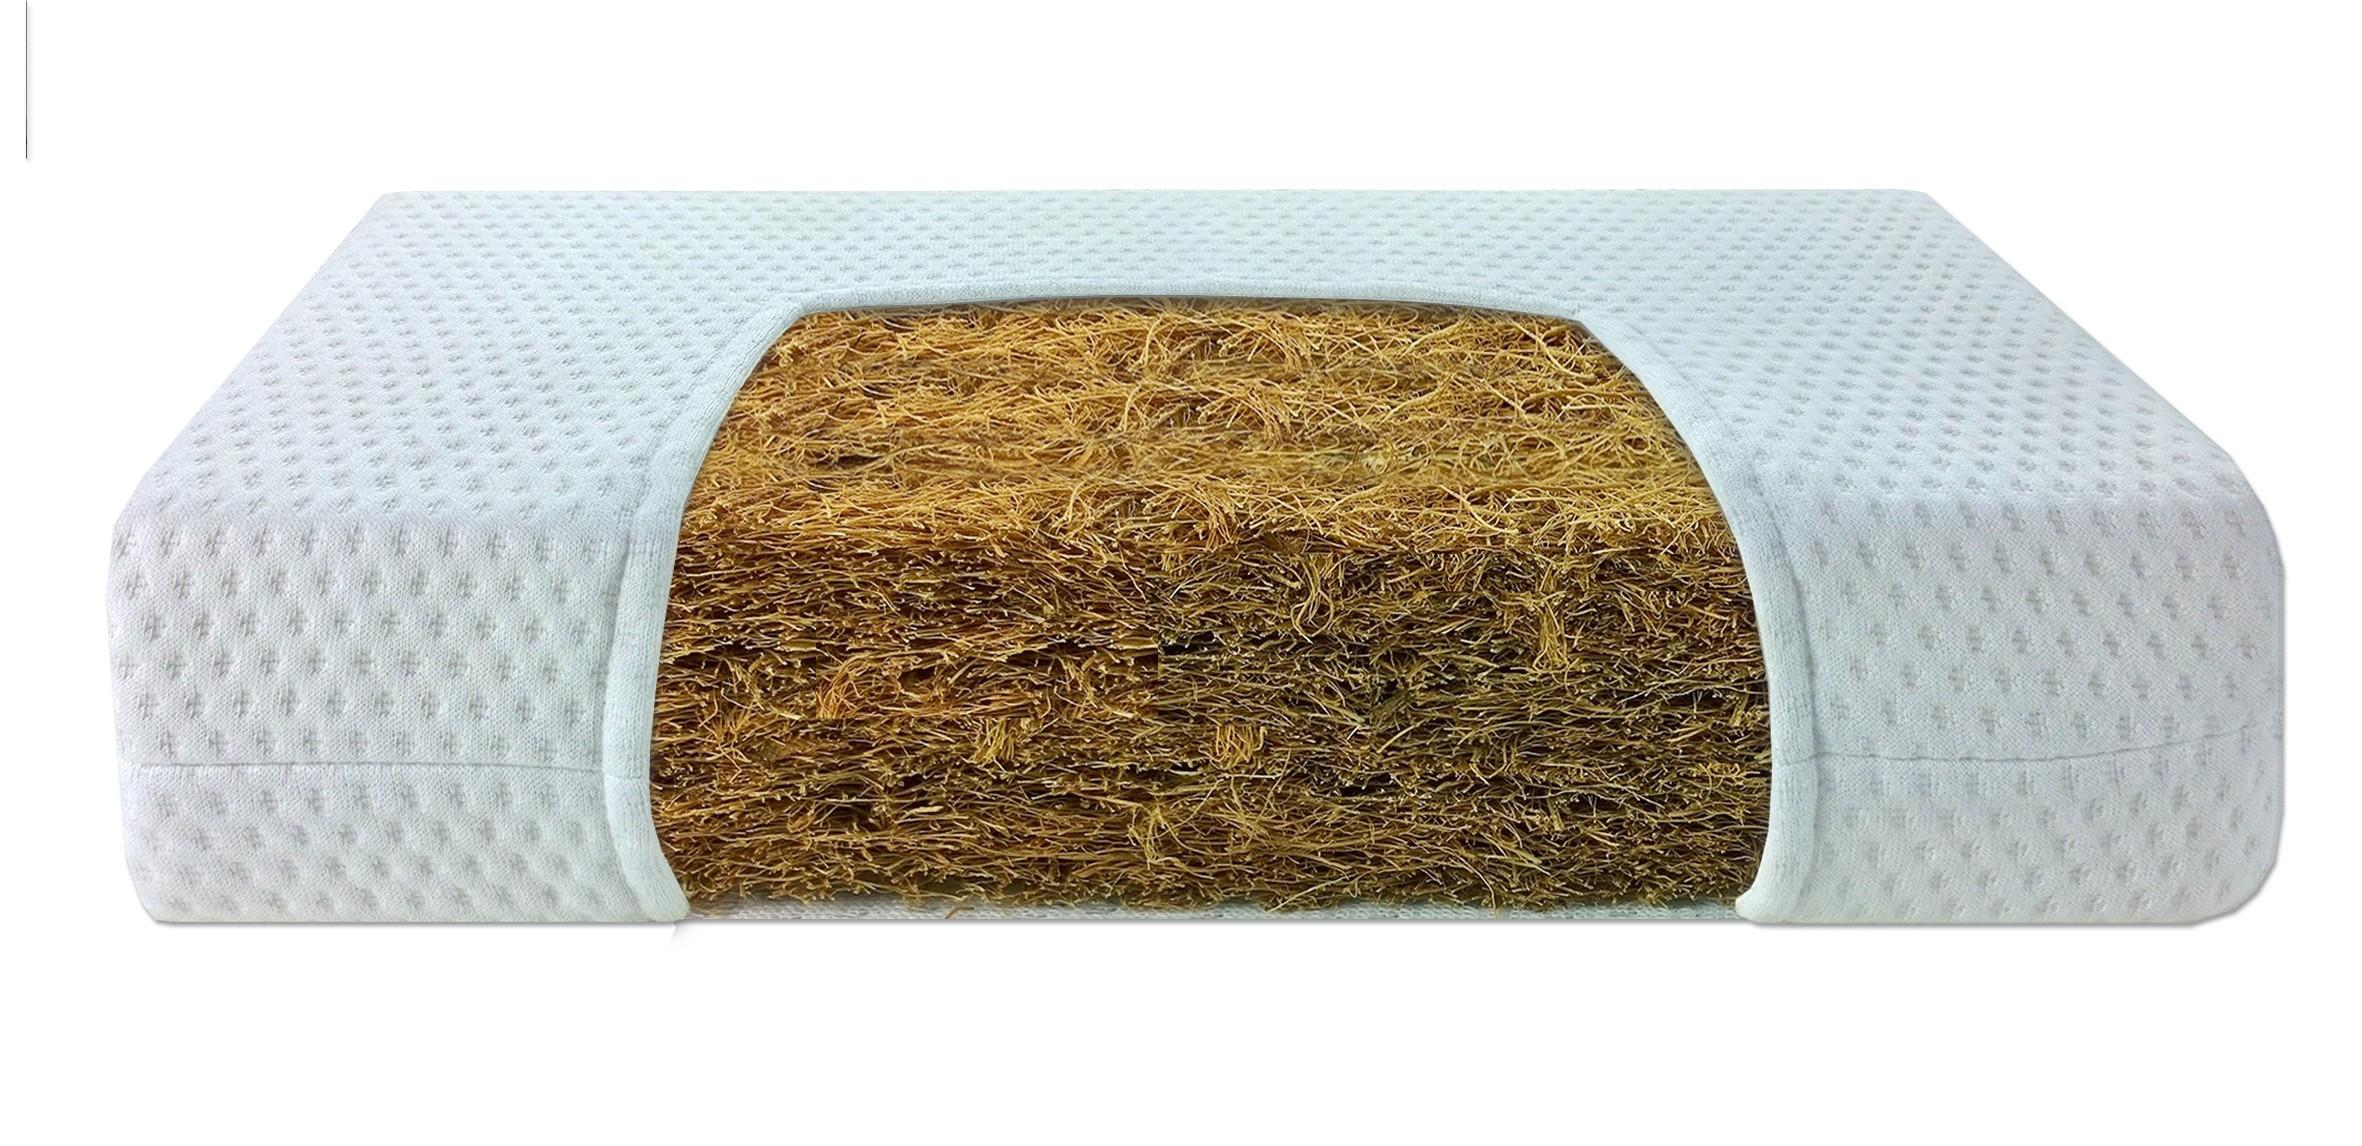 Fiki Miki - Saltea fibra de cocos Integral Komfort 120x60x5 cm